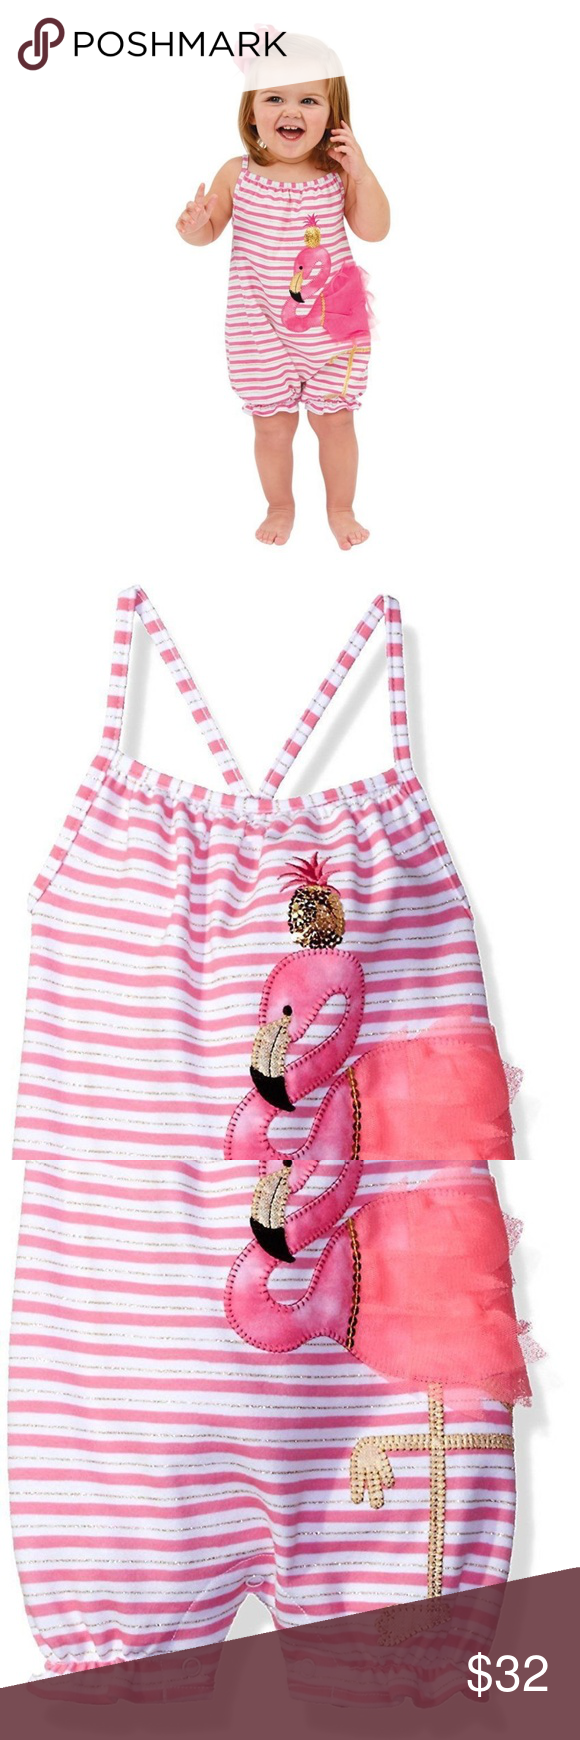 6ceb6d08a Mud Pie Flamingo Bubble Romper Outfit 1 Piece 9-12 NWT